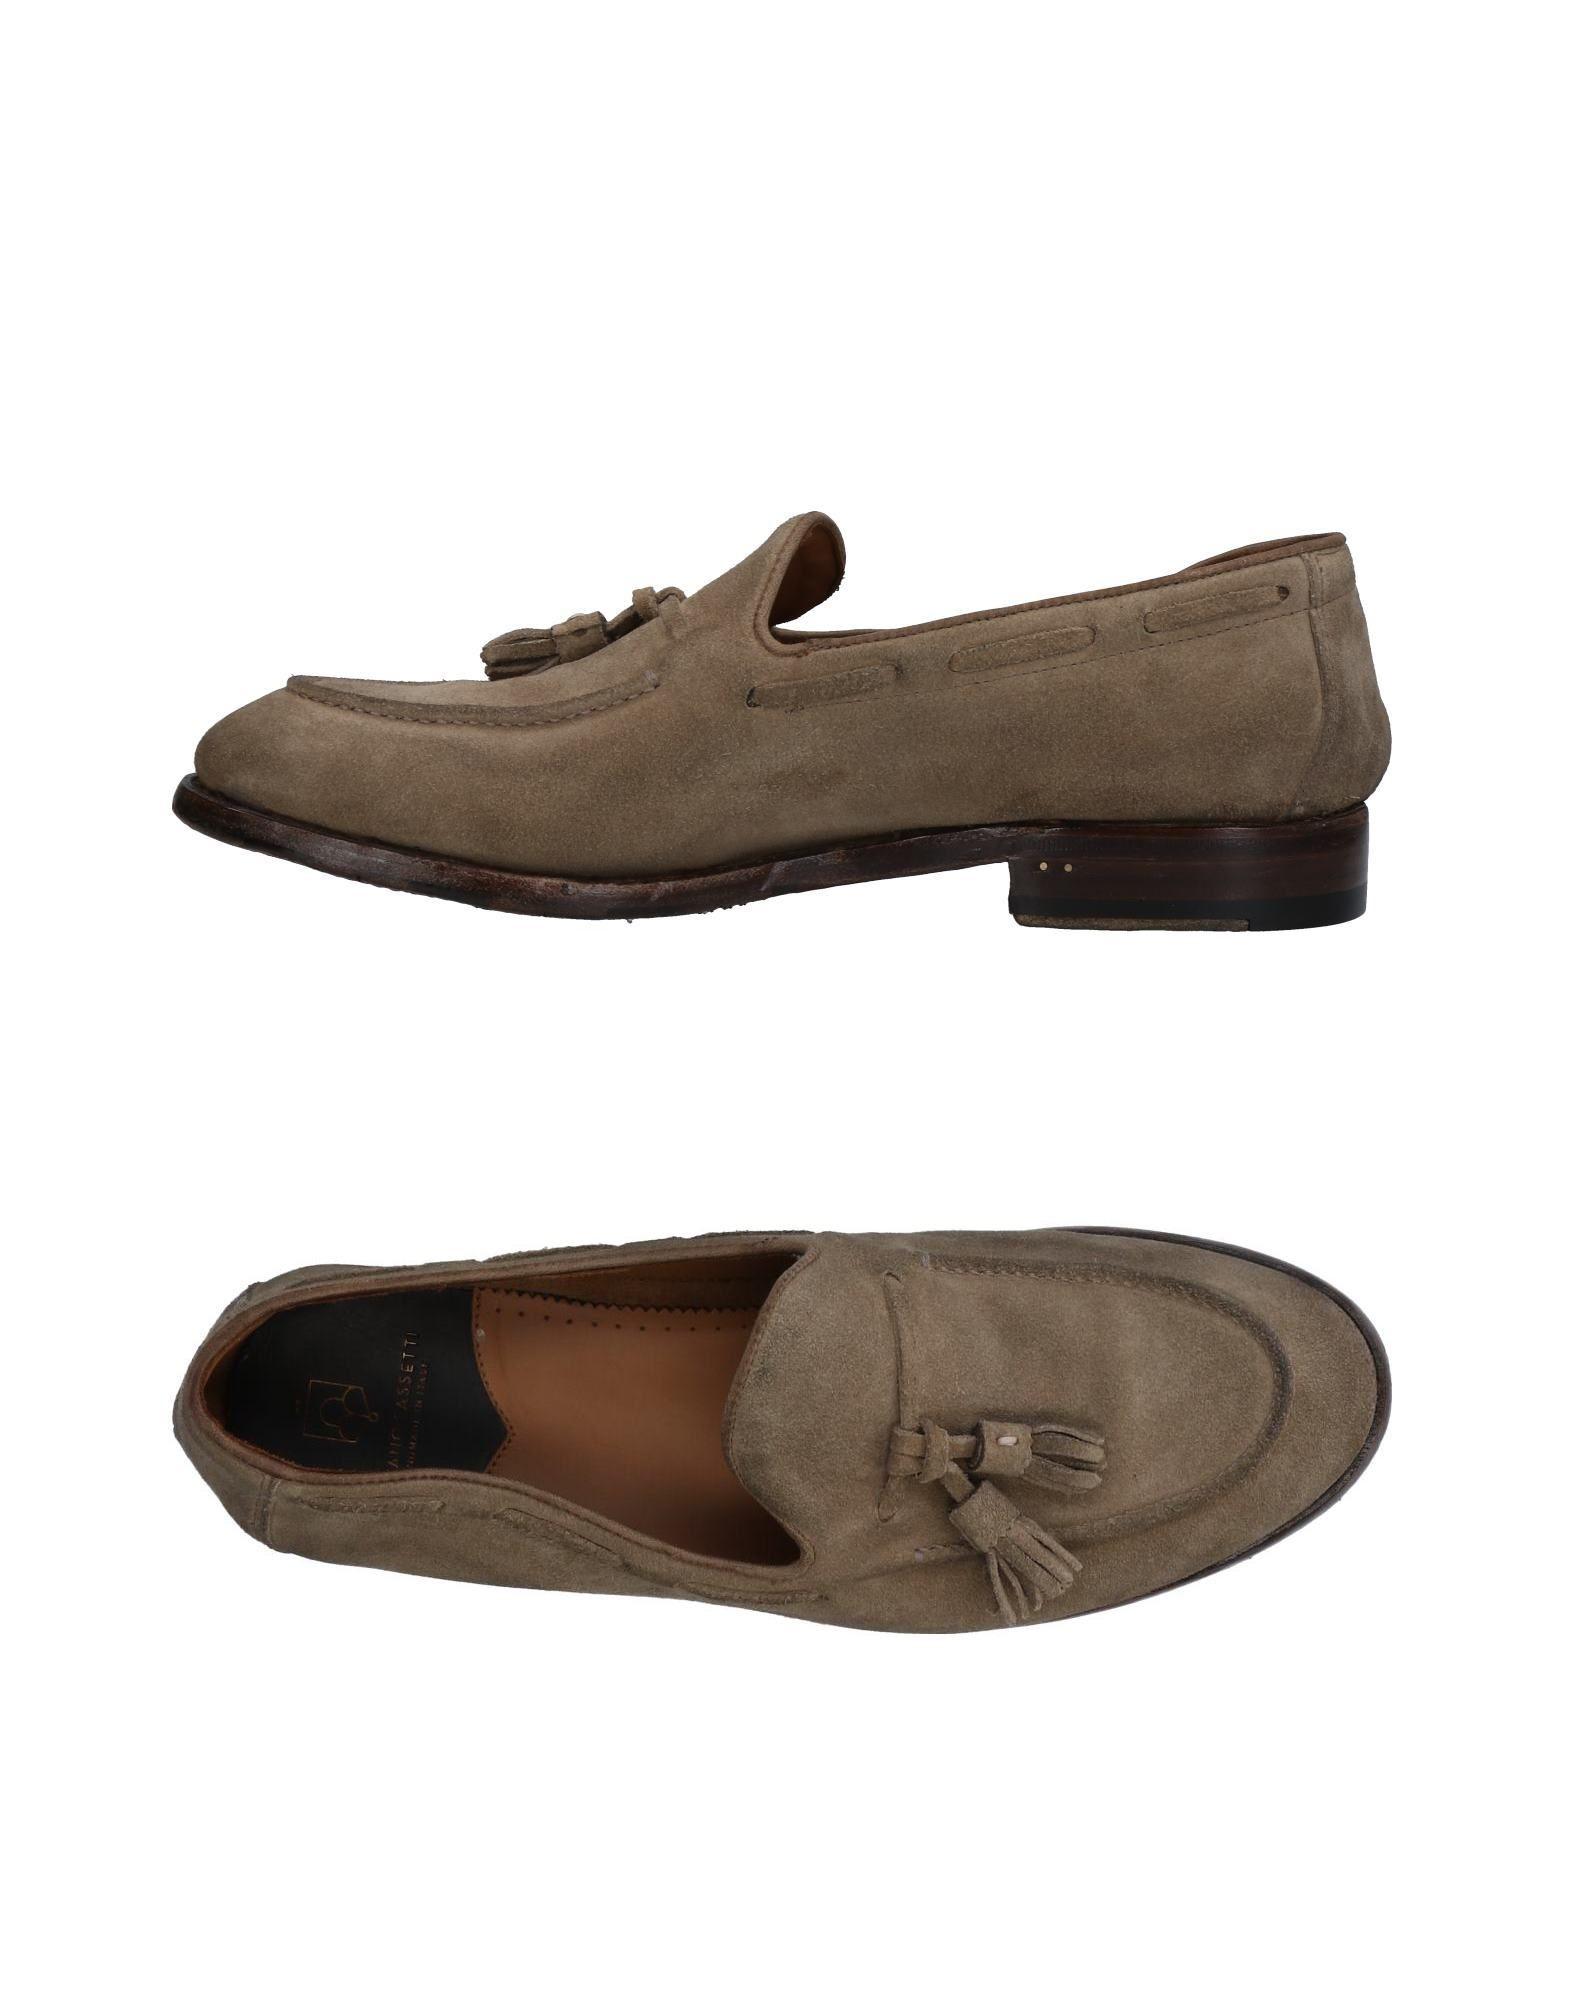 Silvano Sassetti Mokassins Herren  11457319LO Gute Qualität beliebte Schuhe